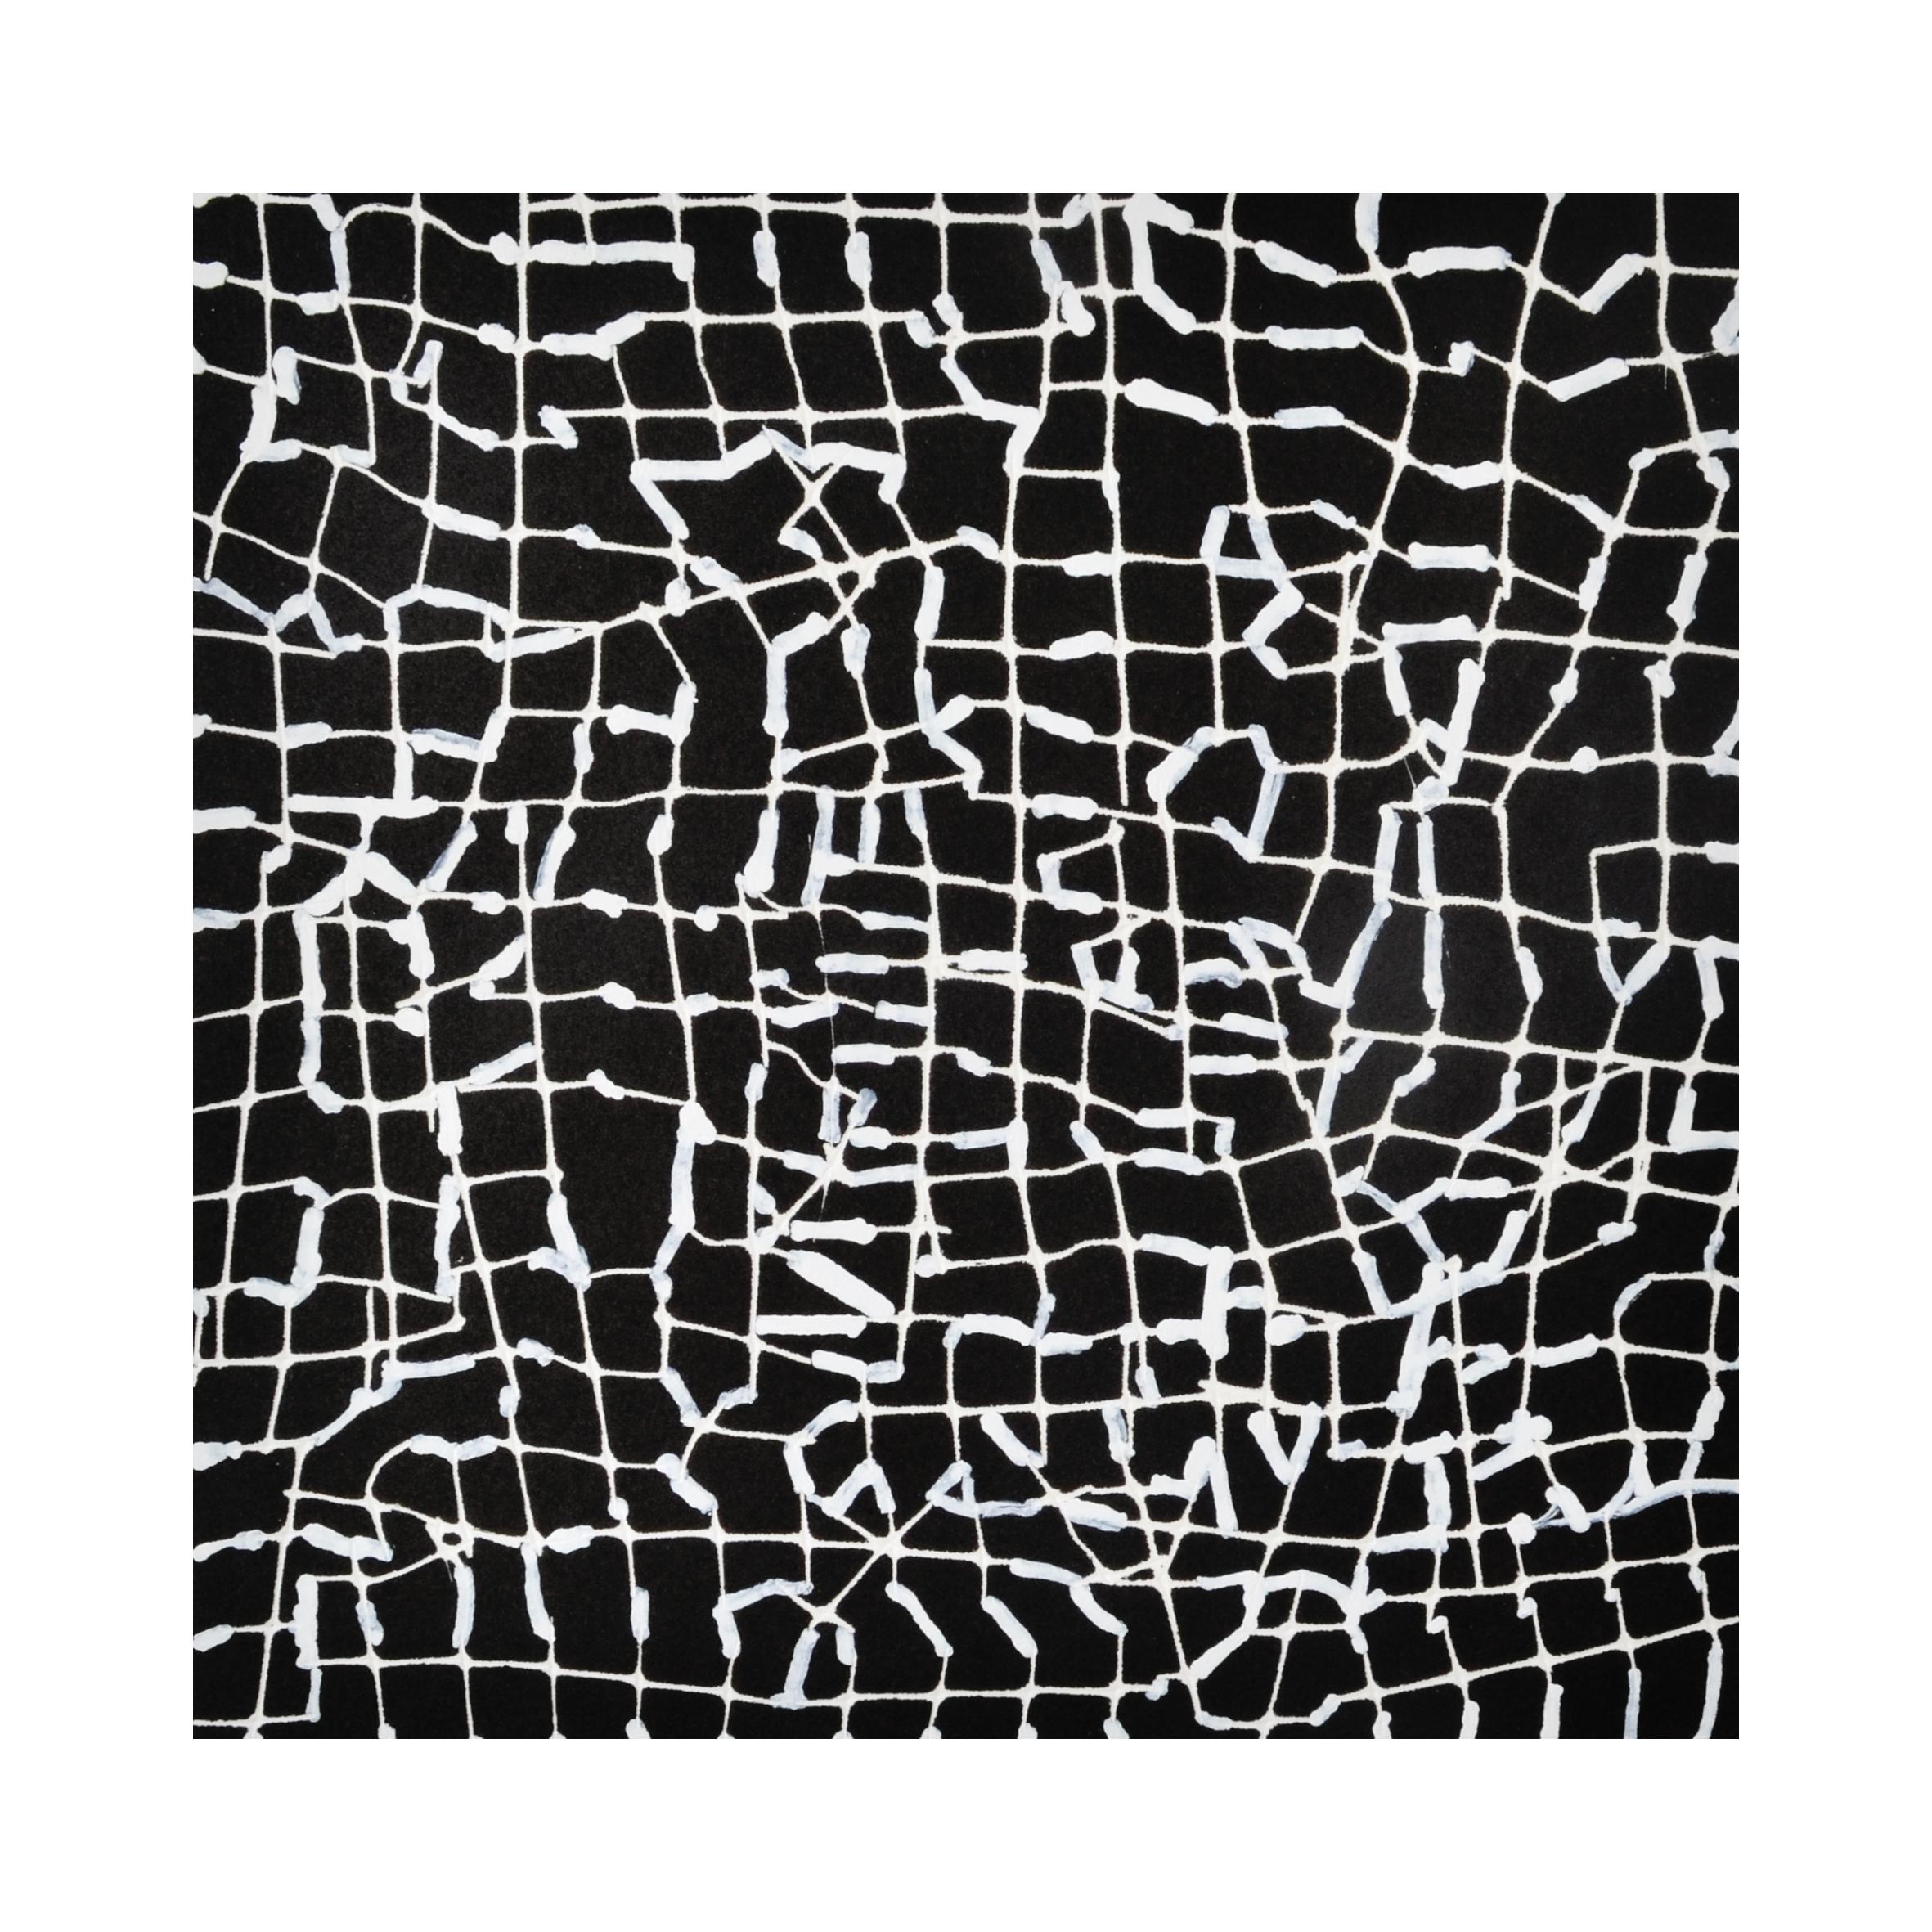 BOELE-KEIMER Black Net No.4 2015.jpg